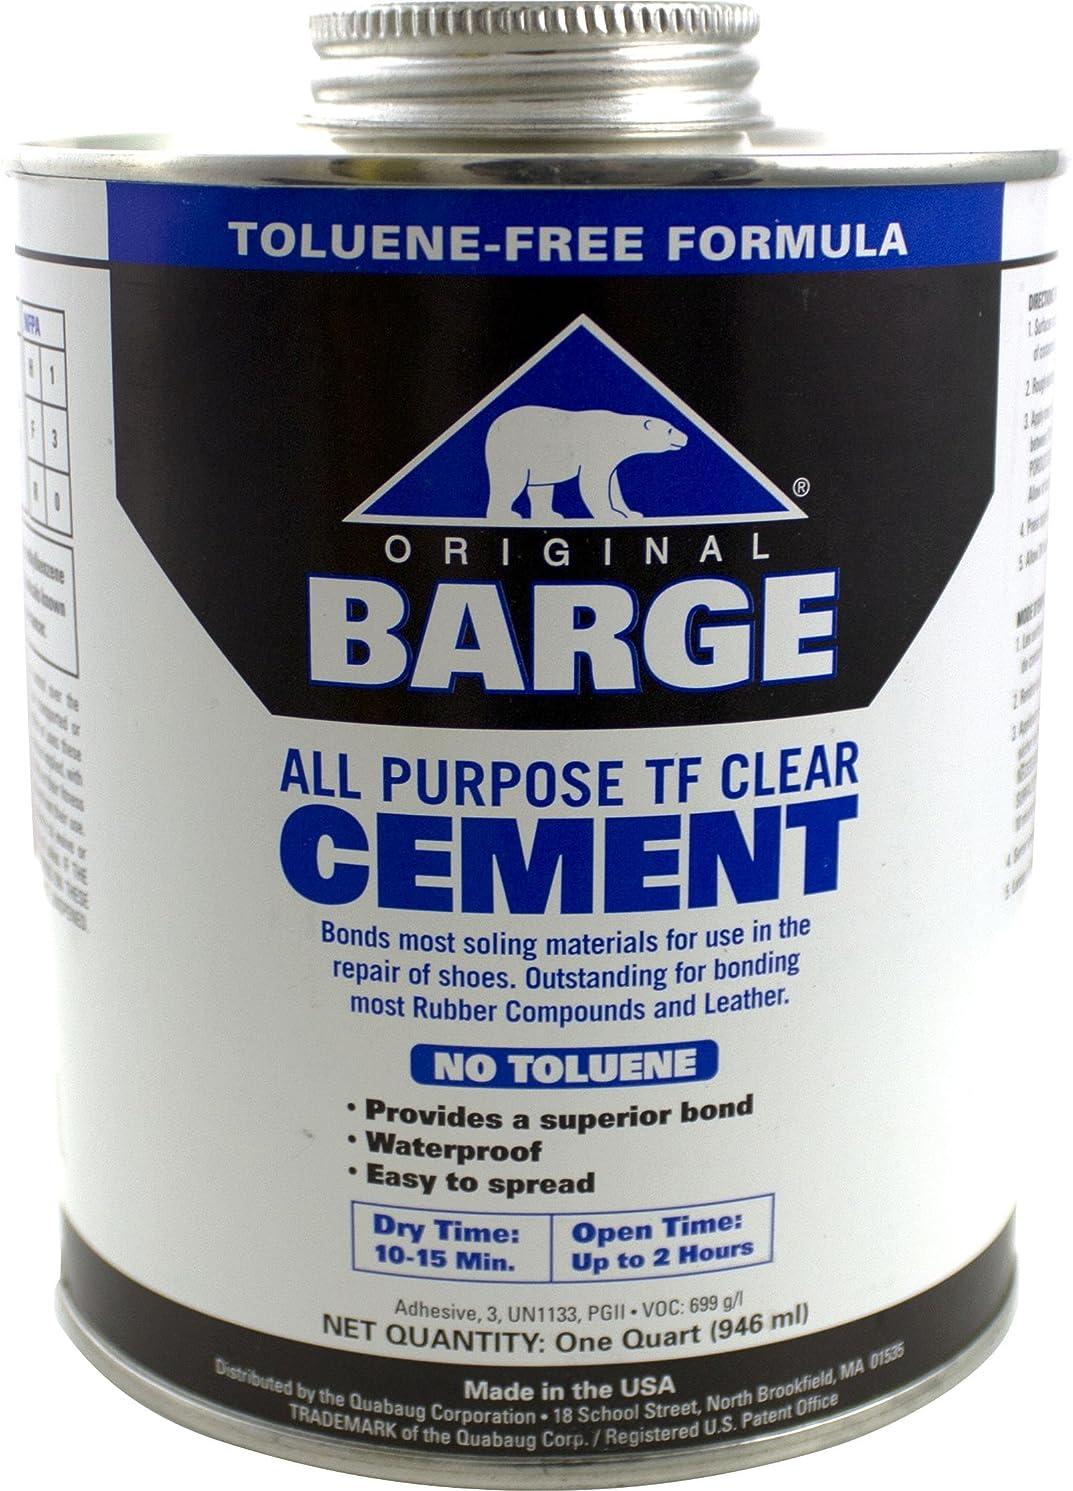 Barge Toluene Free All-Purpose Cement Cement, 32 oz